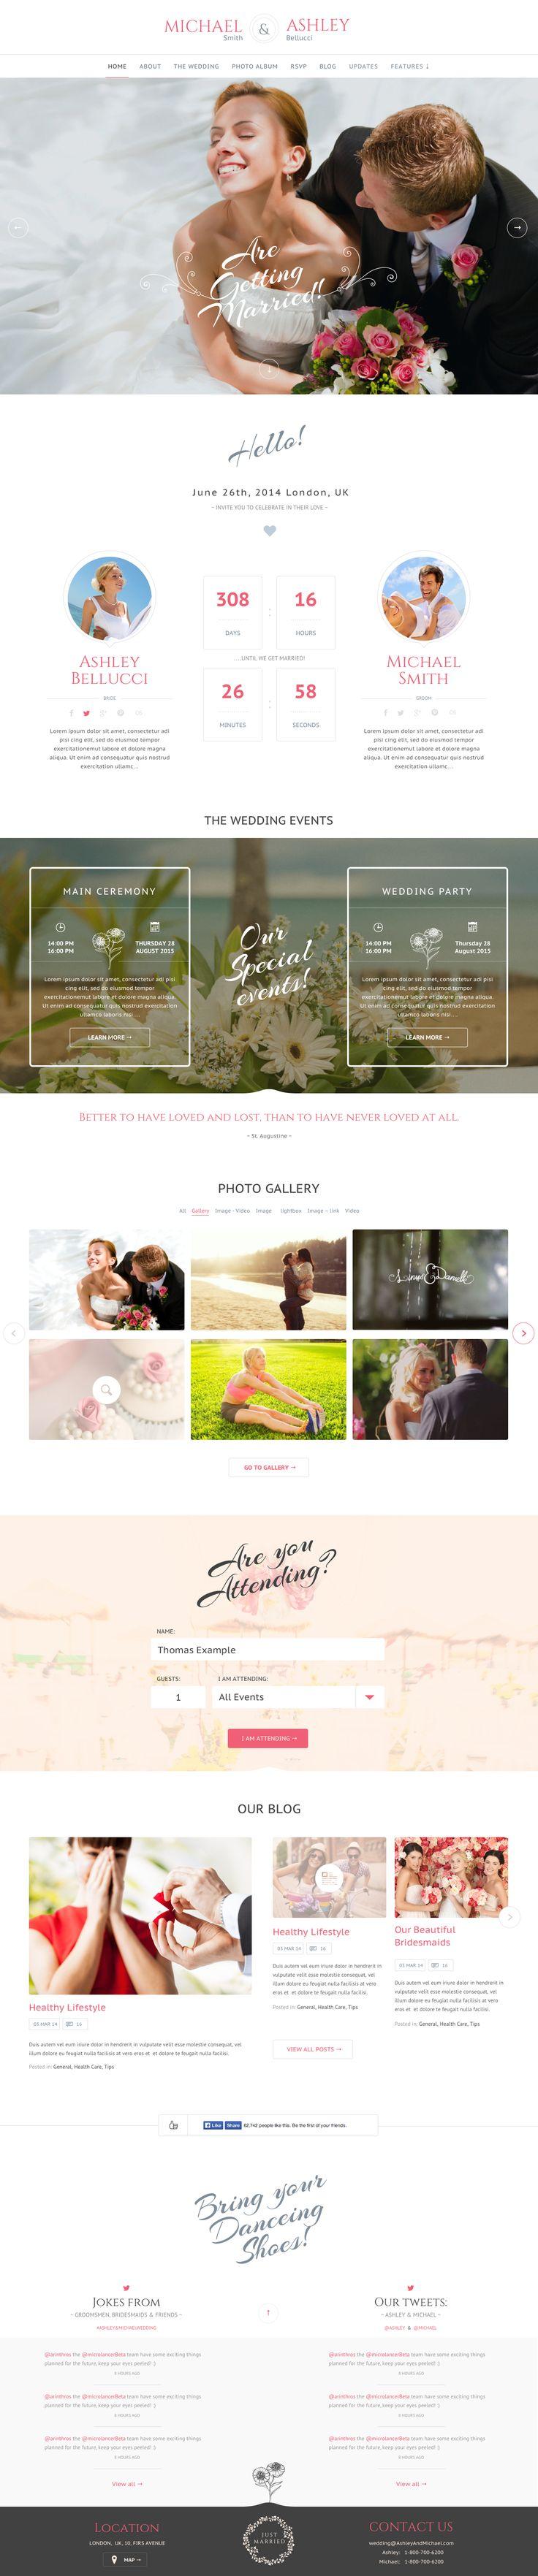 Honeymoon & Wedding Wedding and Wedding Planner Wordpress Theme - Download theme here : http://themeforest.net/item/honeymoon-wedding-wedding-and-wedding-planner/8103339?ref=pxcr